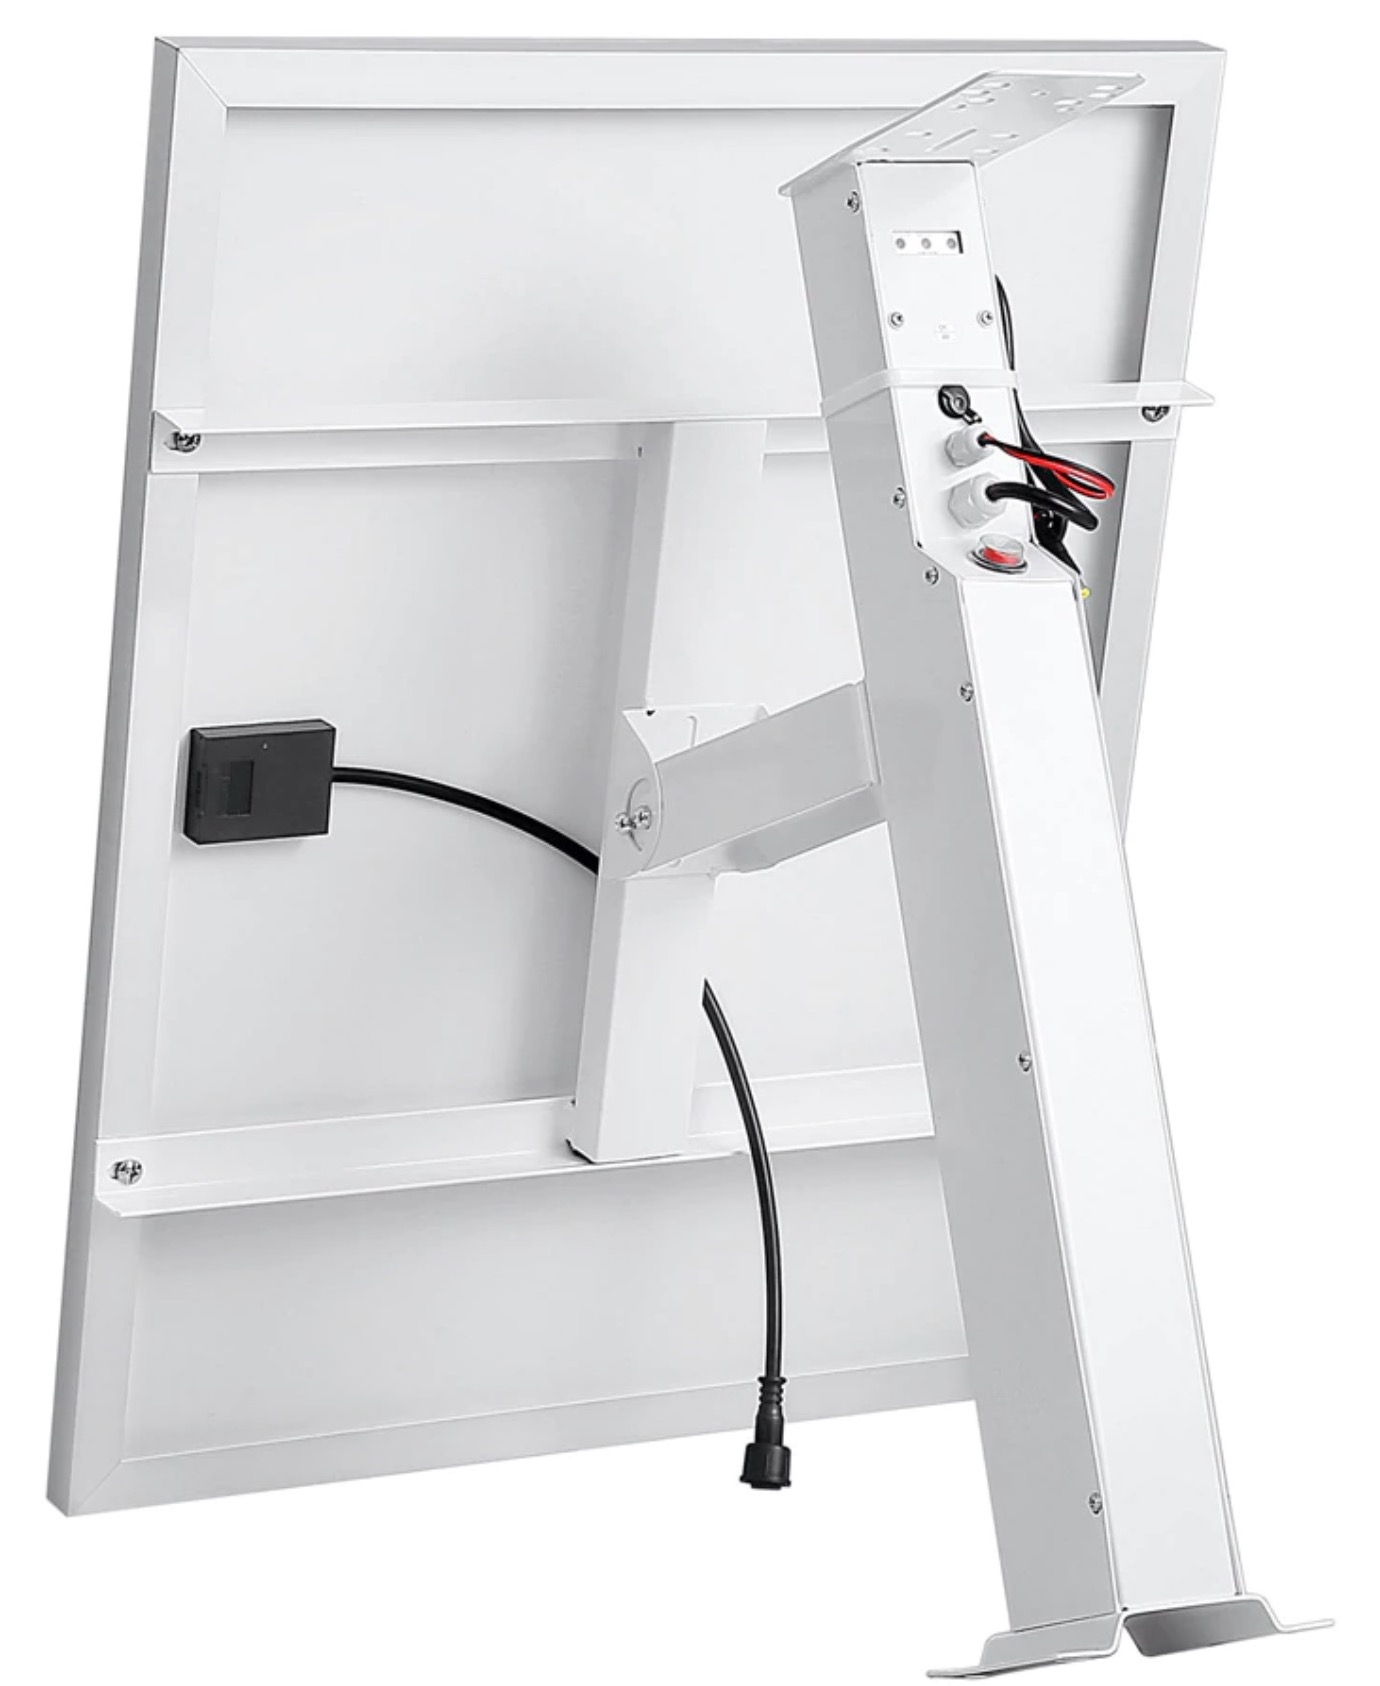 Bracket with Solar Panel & Built-in Batteries - bottom